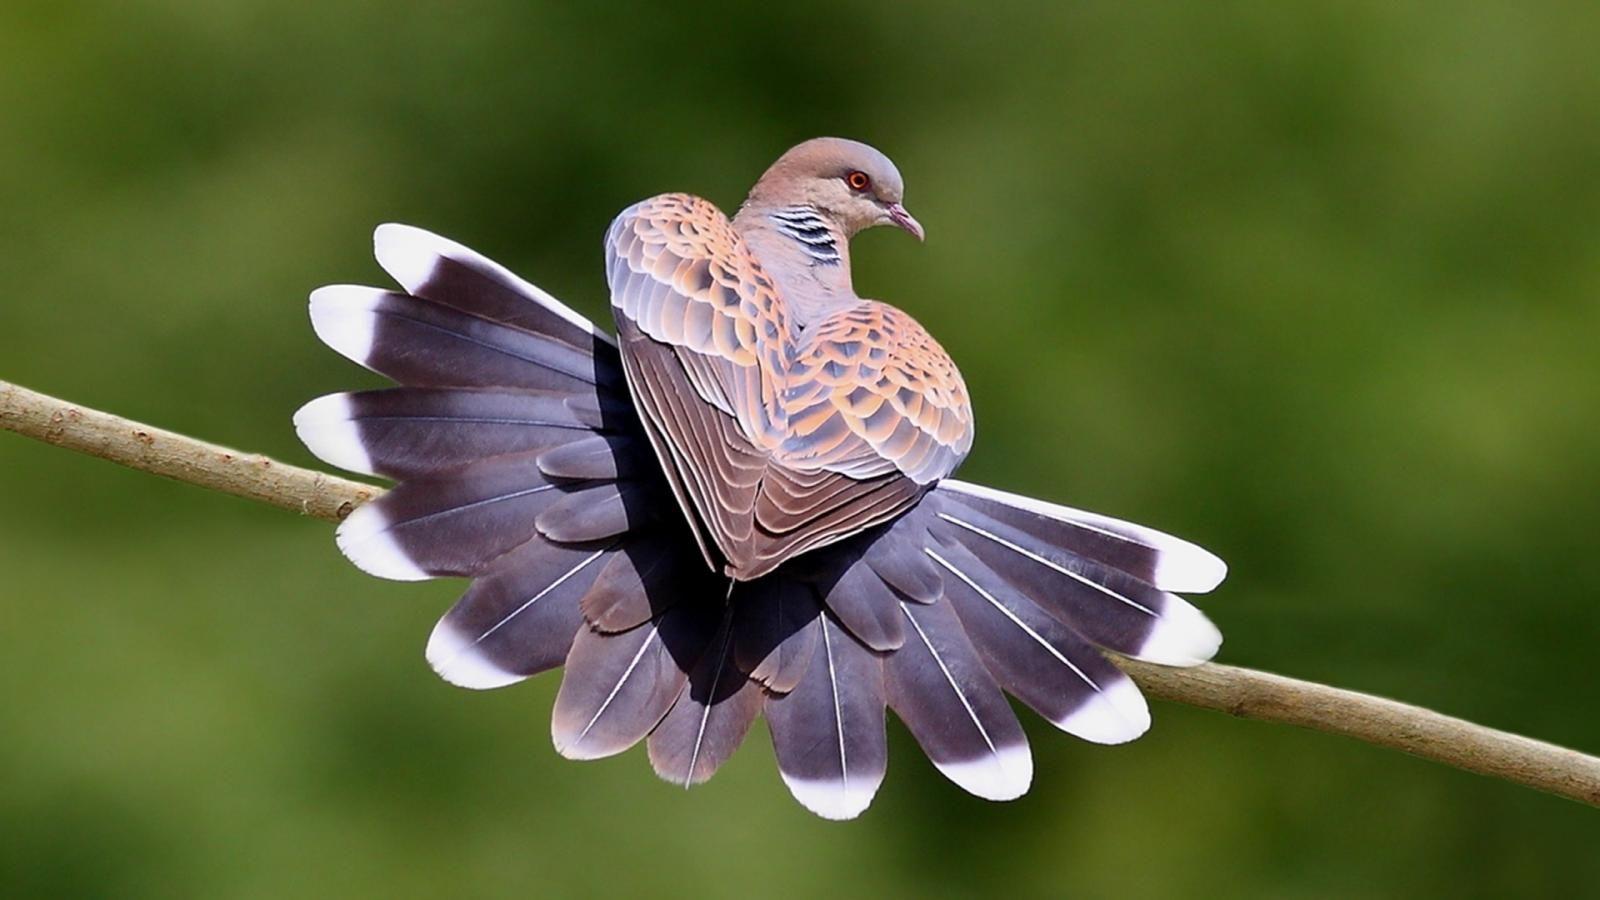 Beautiful Birds in Nature Wallpapers   Birds HD Images ...